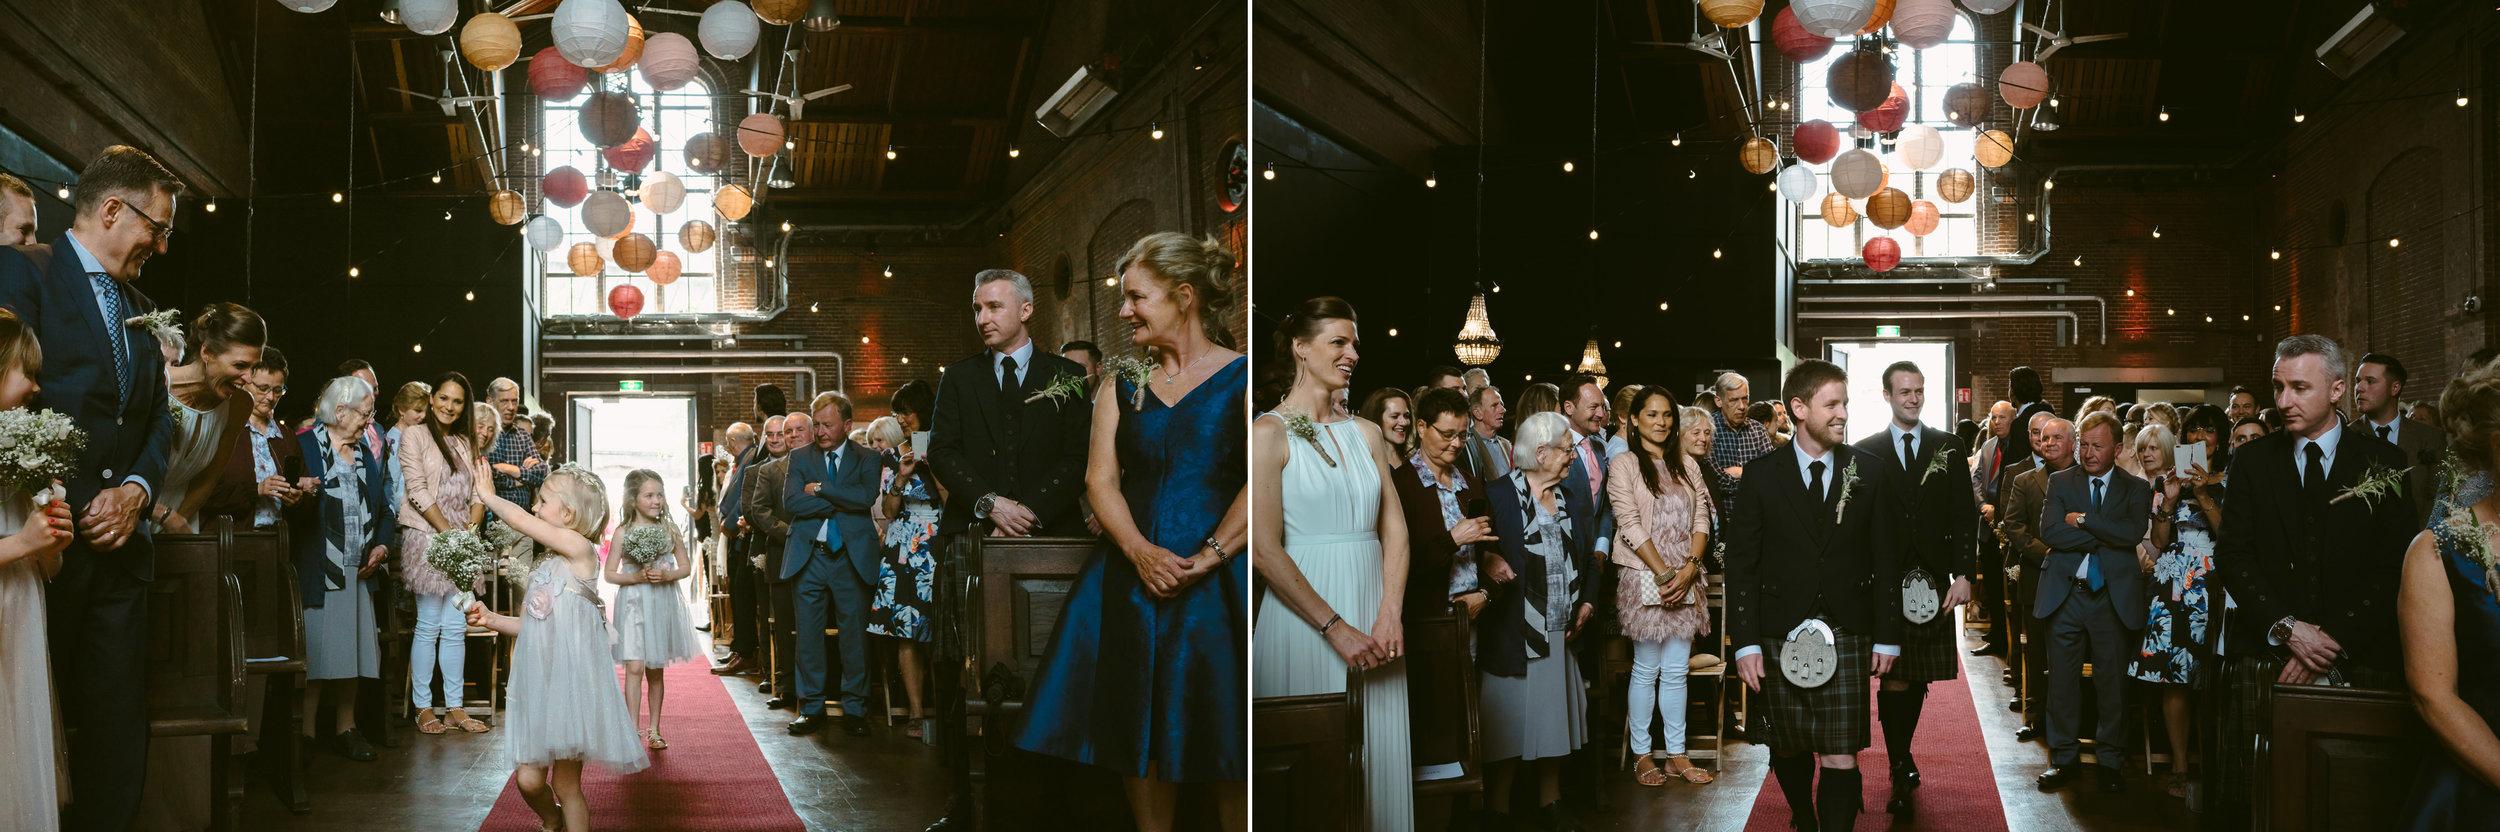 amsterdam-wedding-photographer-trouwfotograaf-bruidsfotograaf-mark-hadden-bruidsfotografie-David & Ronald-140 copy.jpg